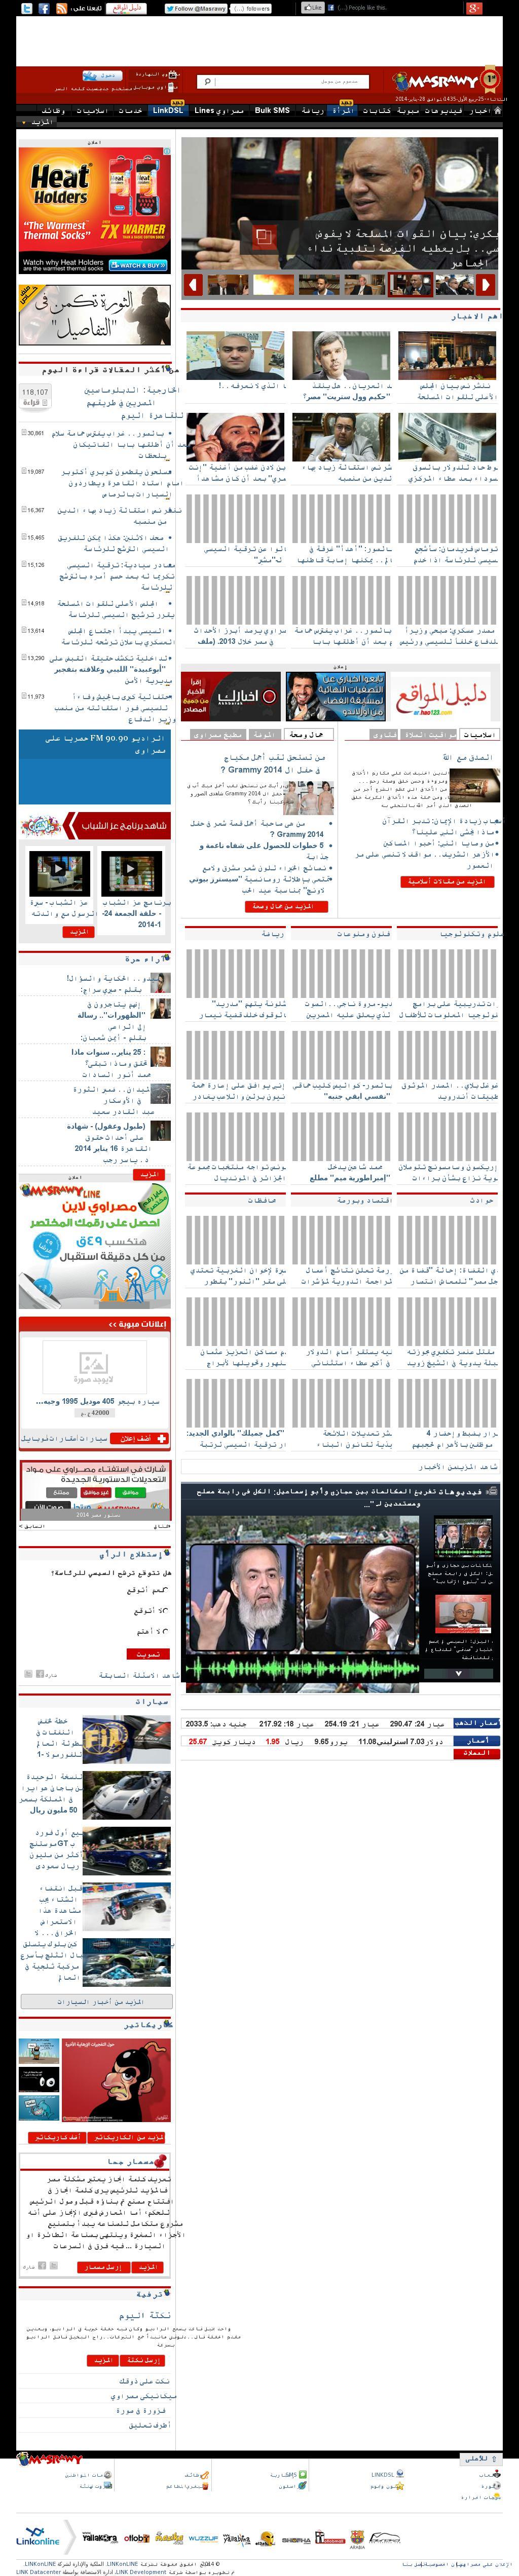 Masrawy at Tuesday Jan. 28, 2014, 2:13 a.m. UTC